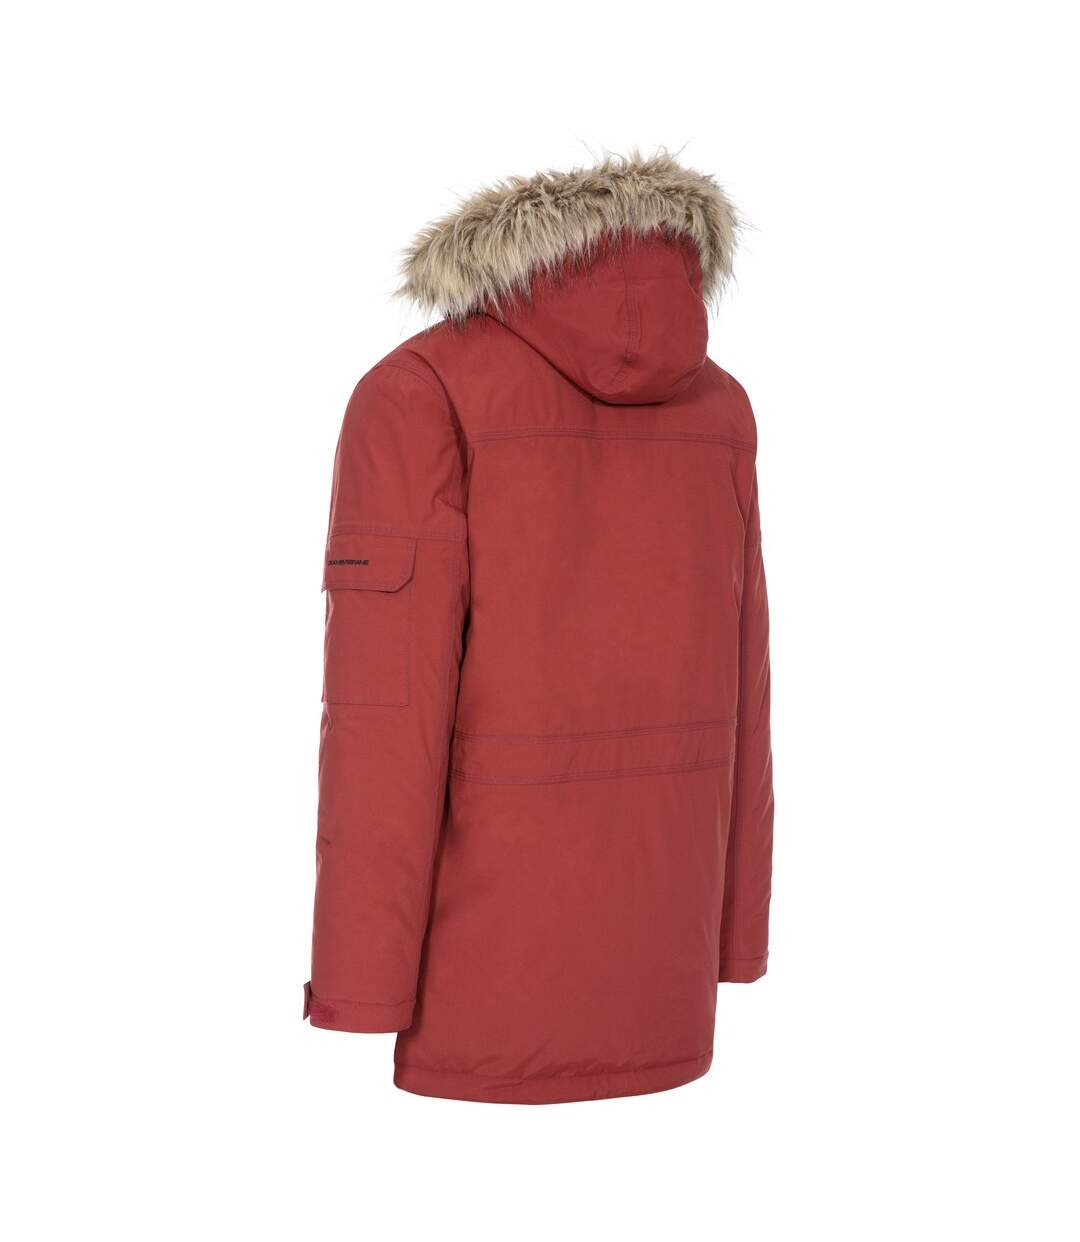 Trespass Mens Highland Waterproof Parka Jacket (Black) - UTTP1304